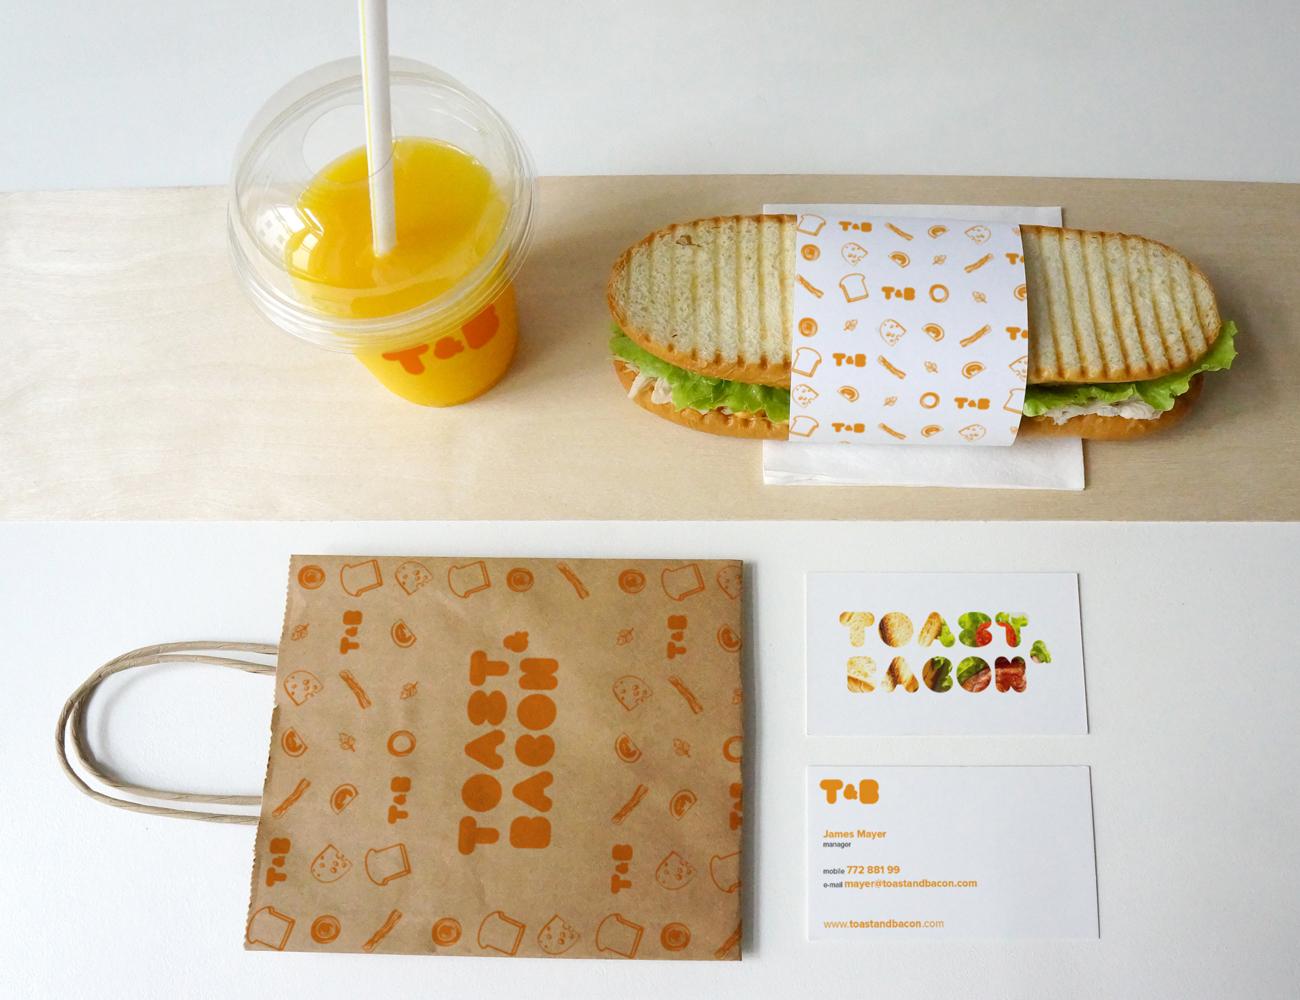 Toast & Bacon restaurant branding